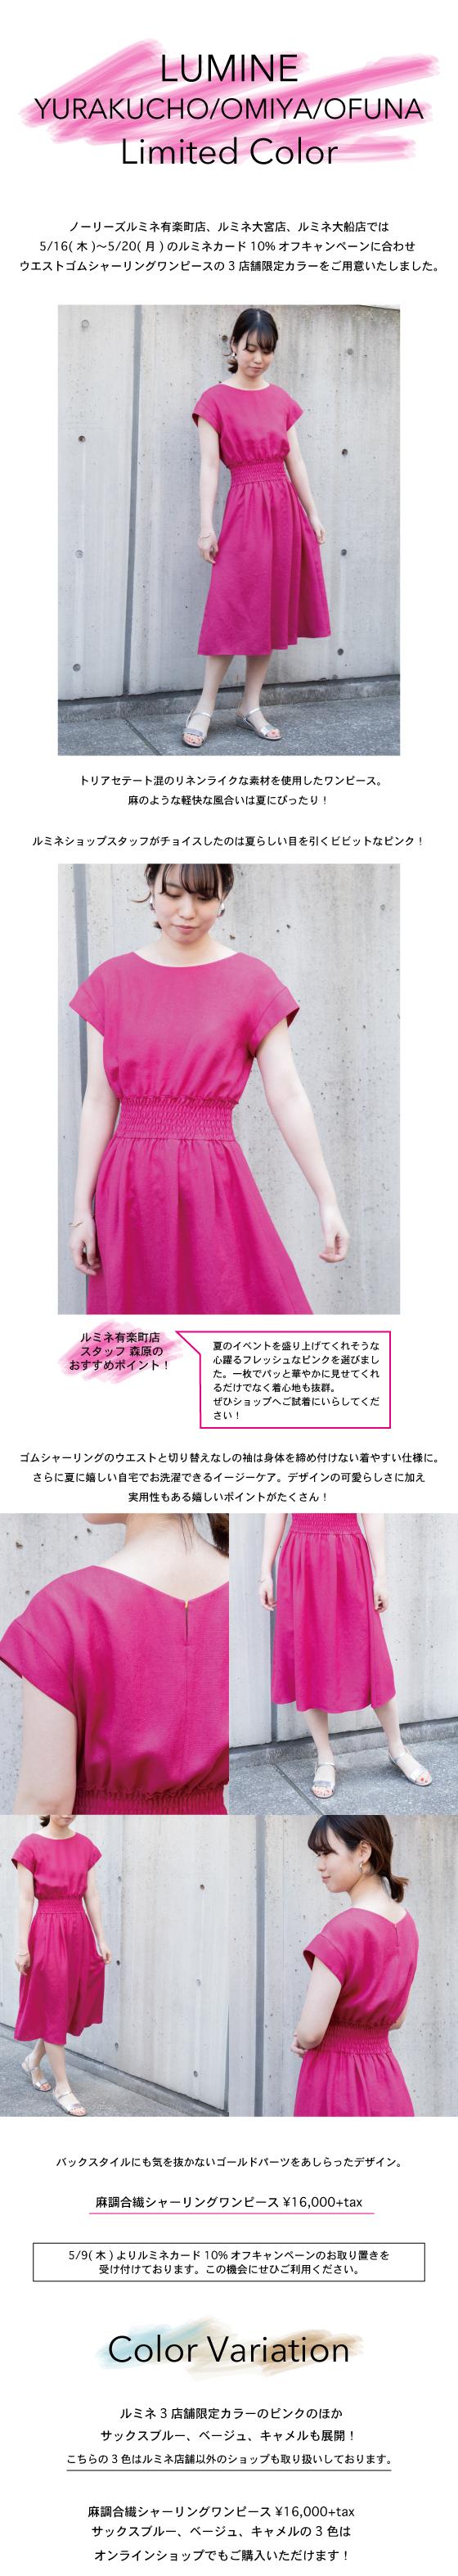 lumine_limited_19s_news0510